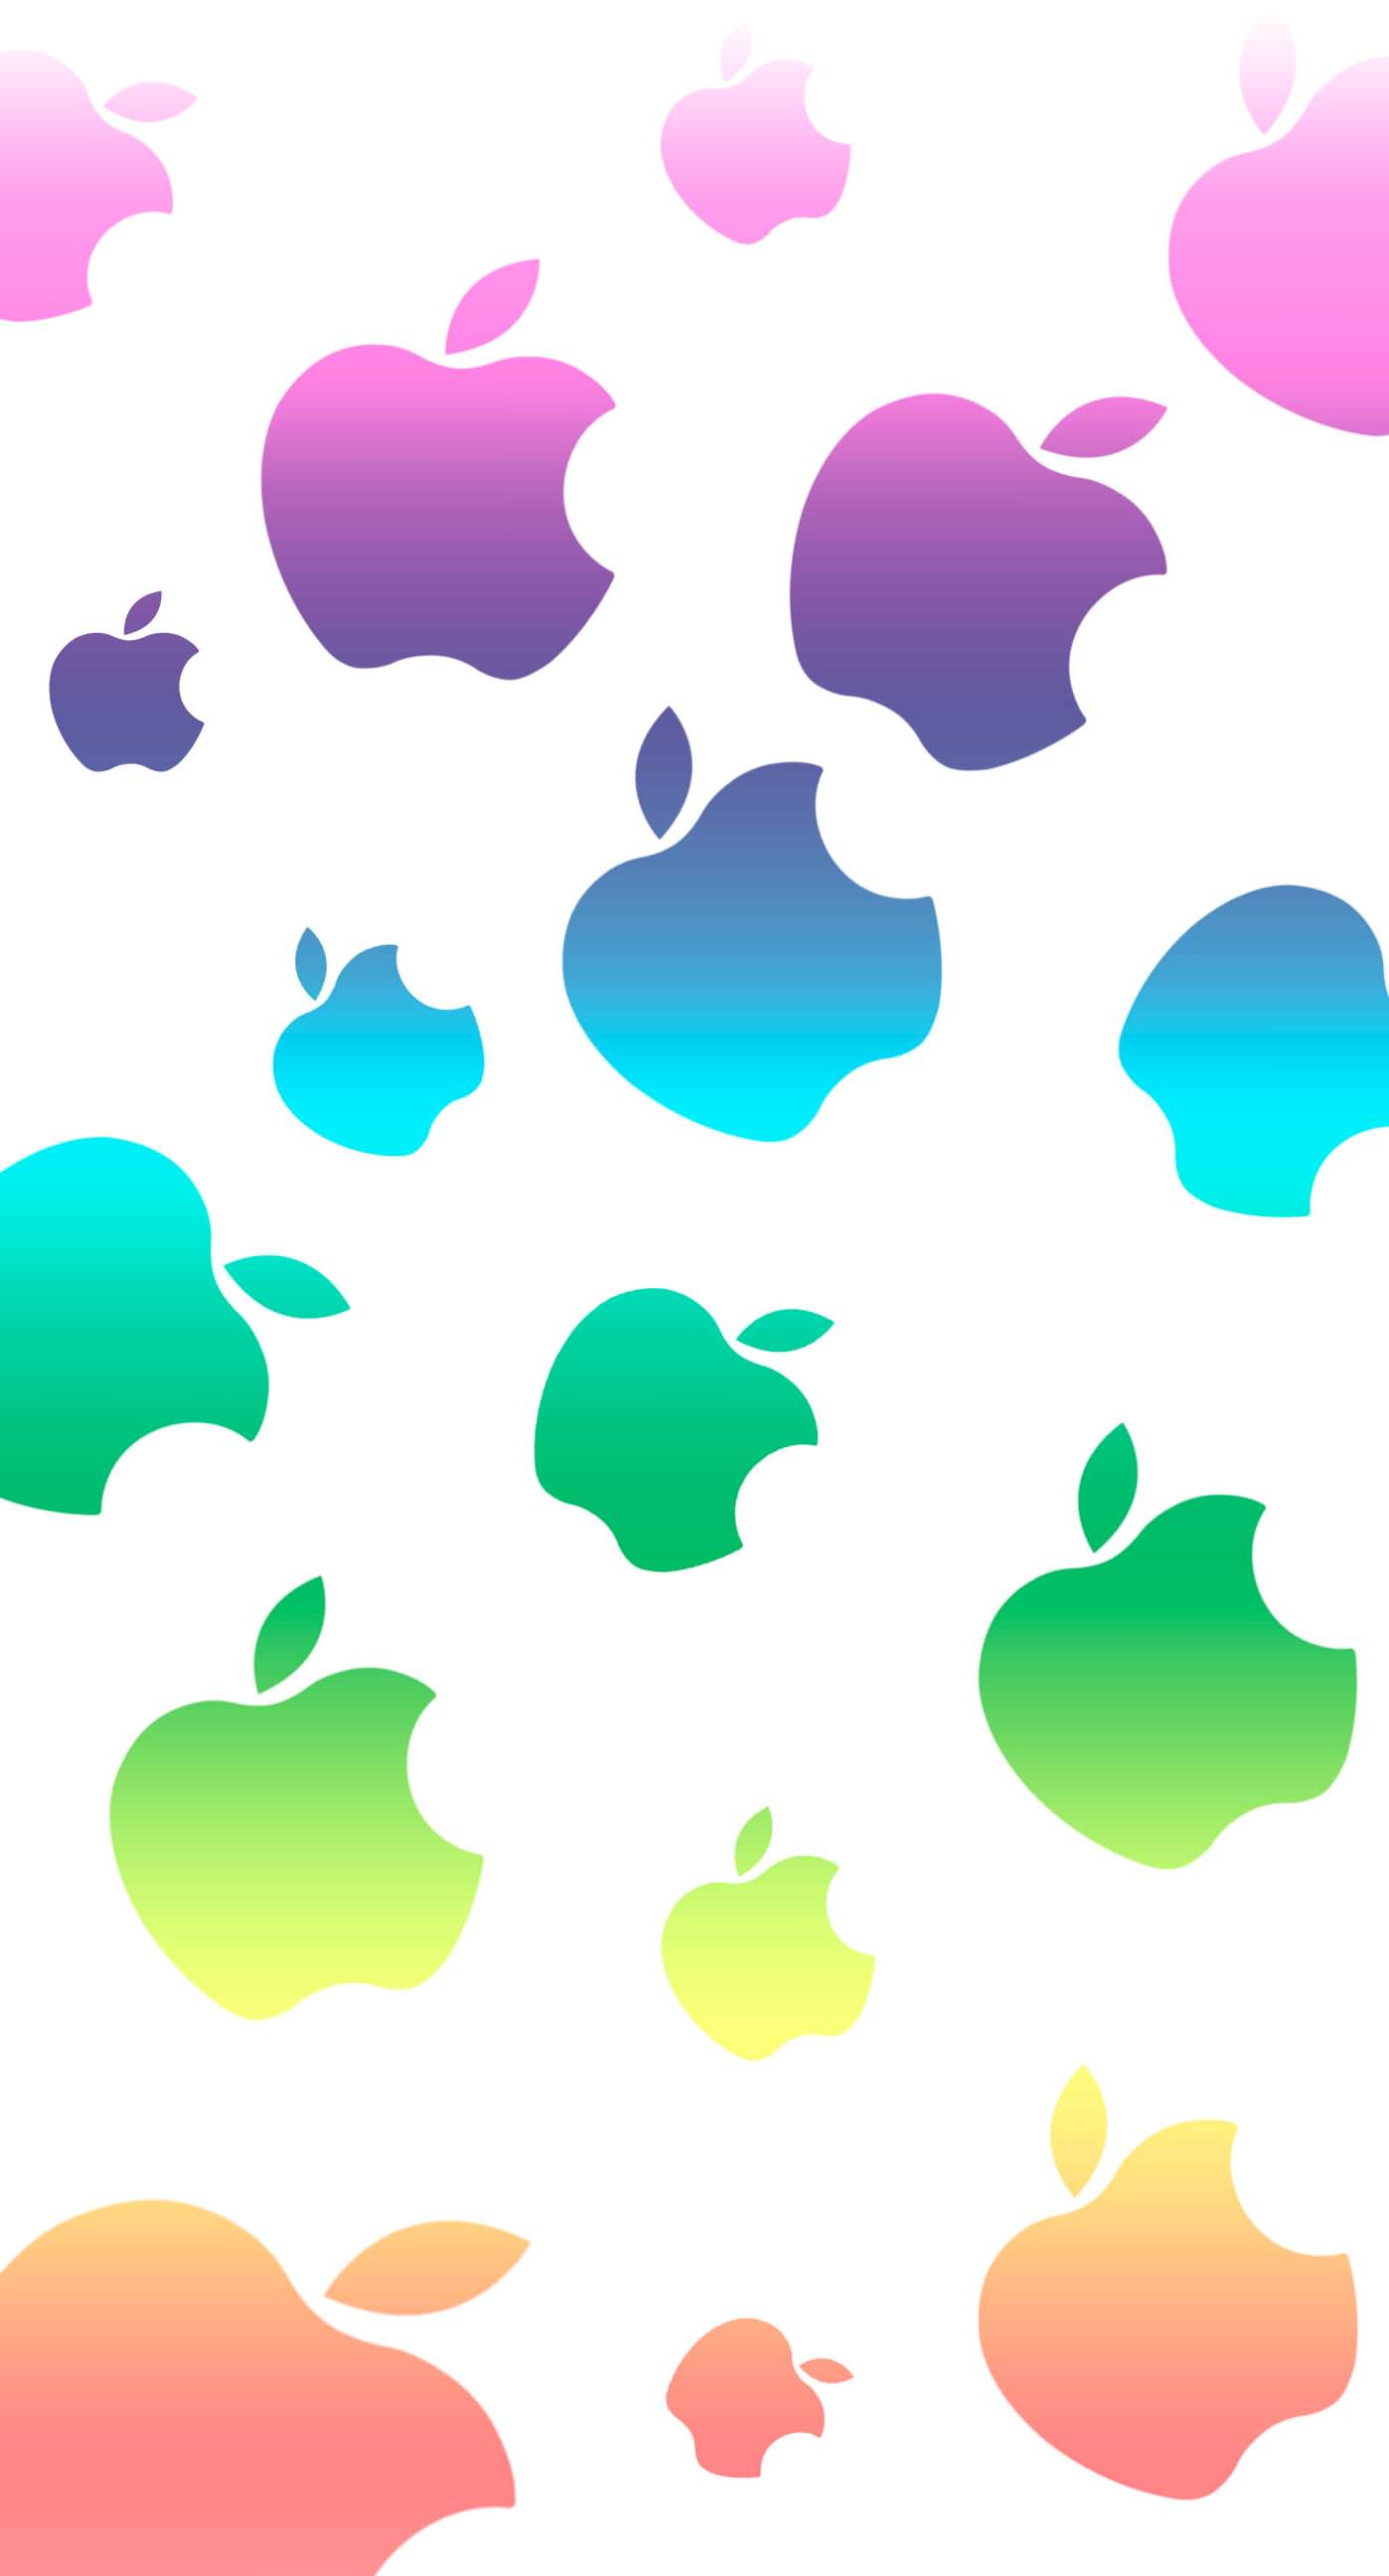 Appleカラフル可愛い Wallpaper Sc Iphone6splus壁紙